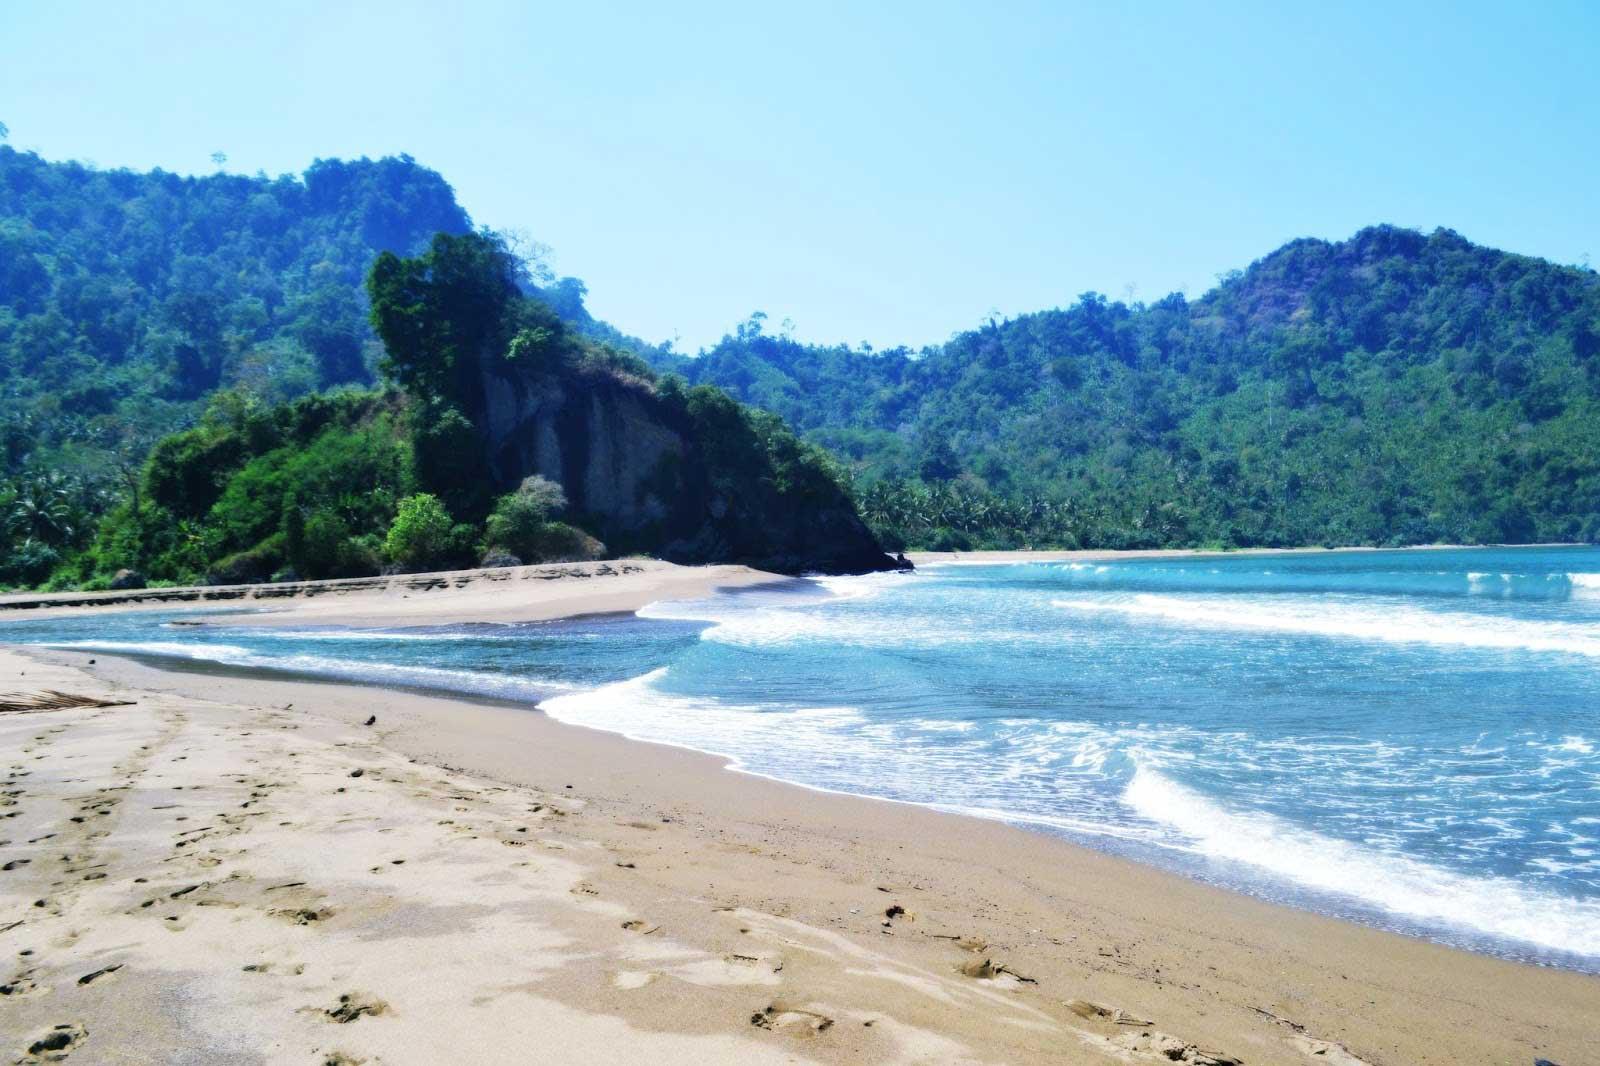 Tempat Wisata di Malang - Pantai Sipelot